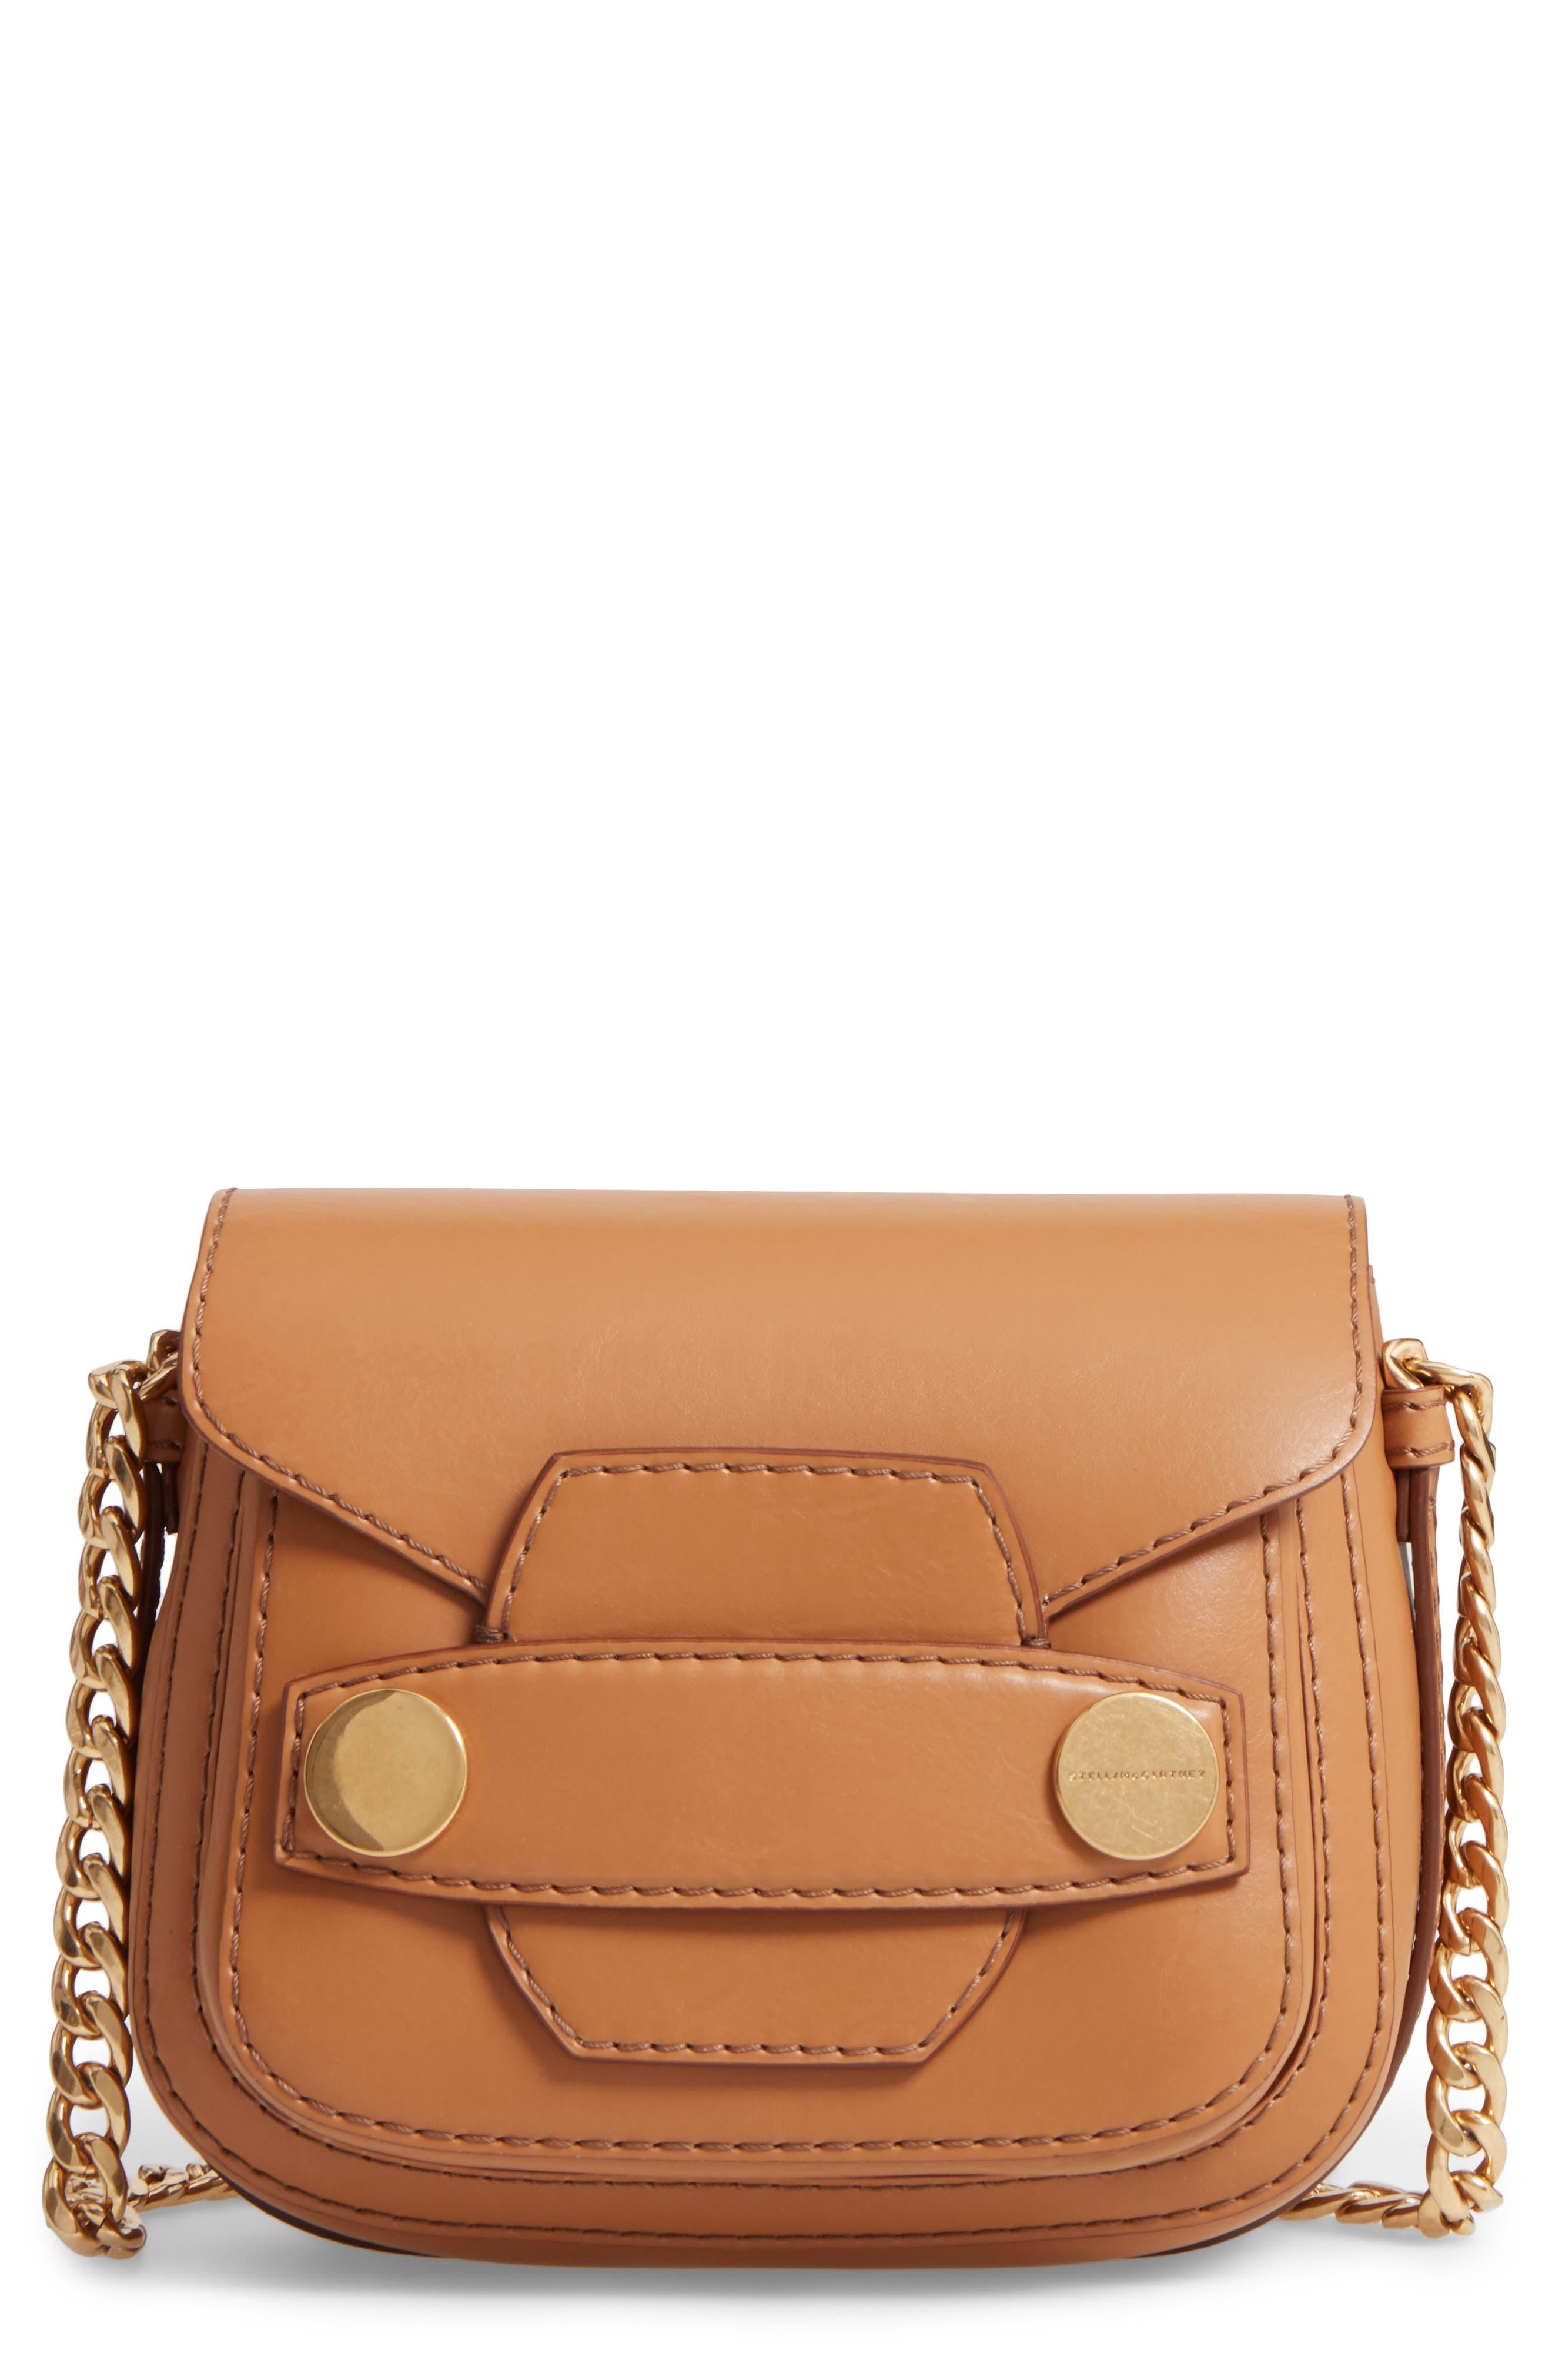 Main Image - Stella McCartney Textured Faux Leather Crossbody Bag